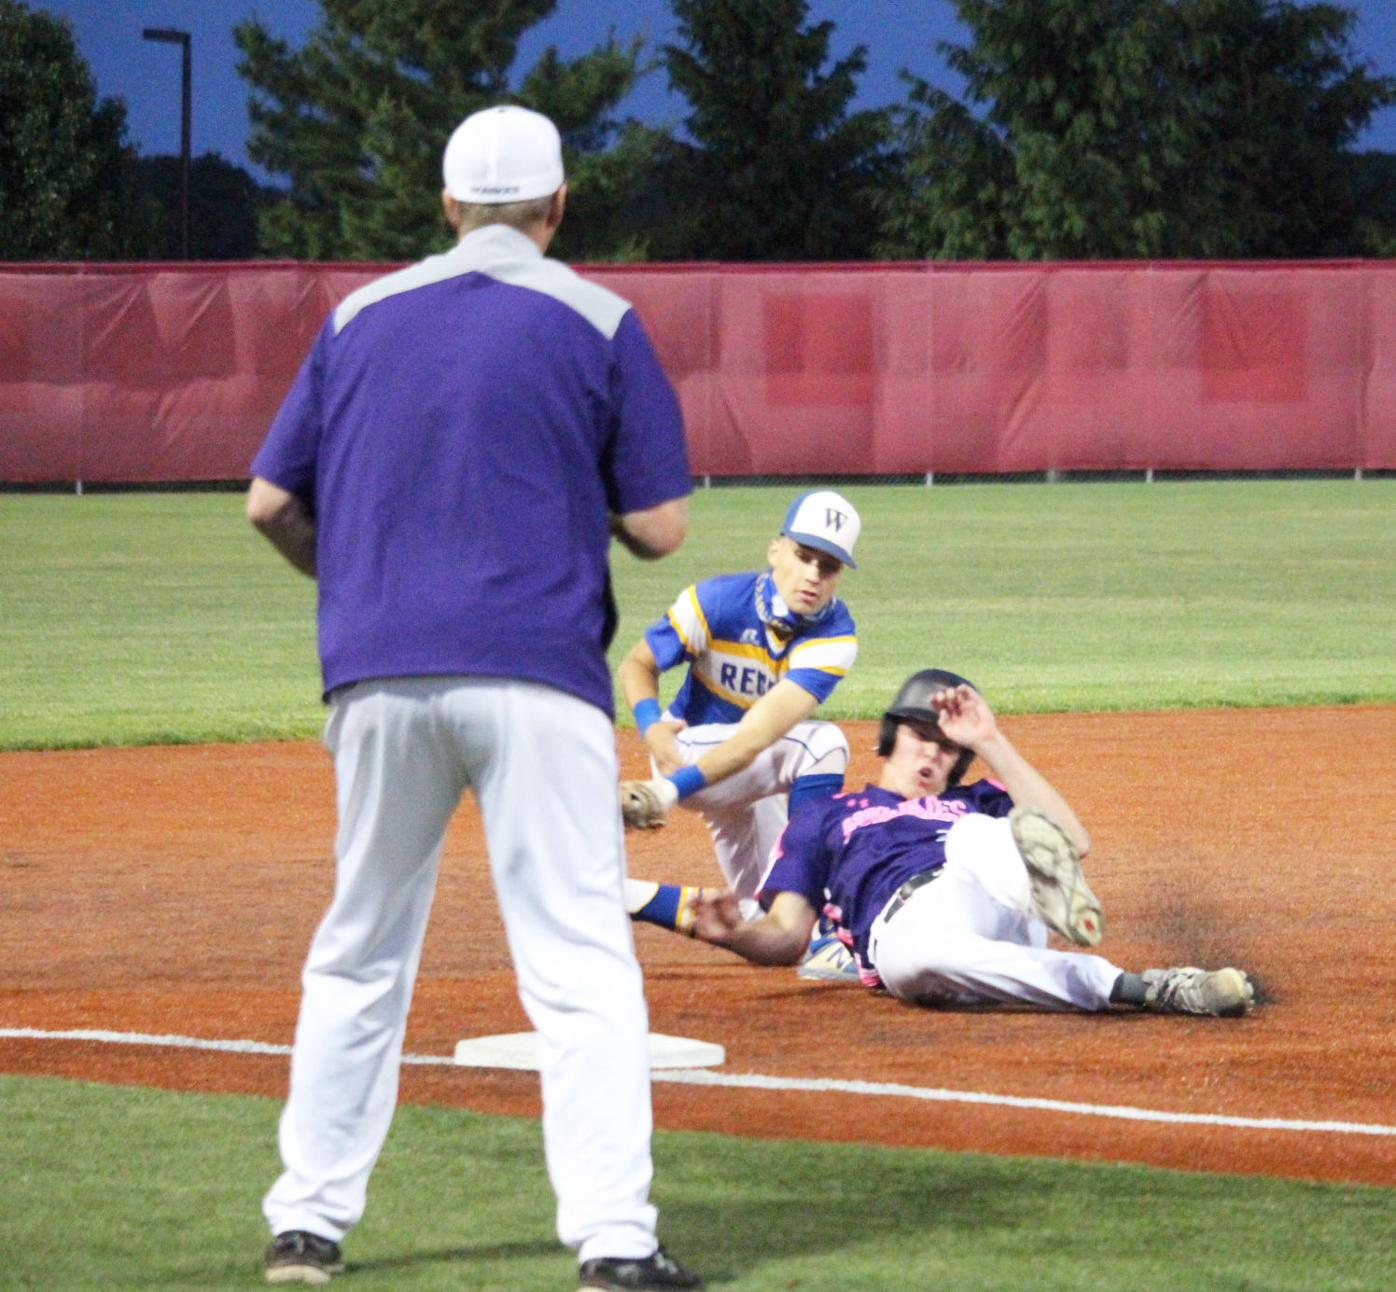 Sliding into third base